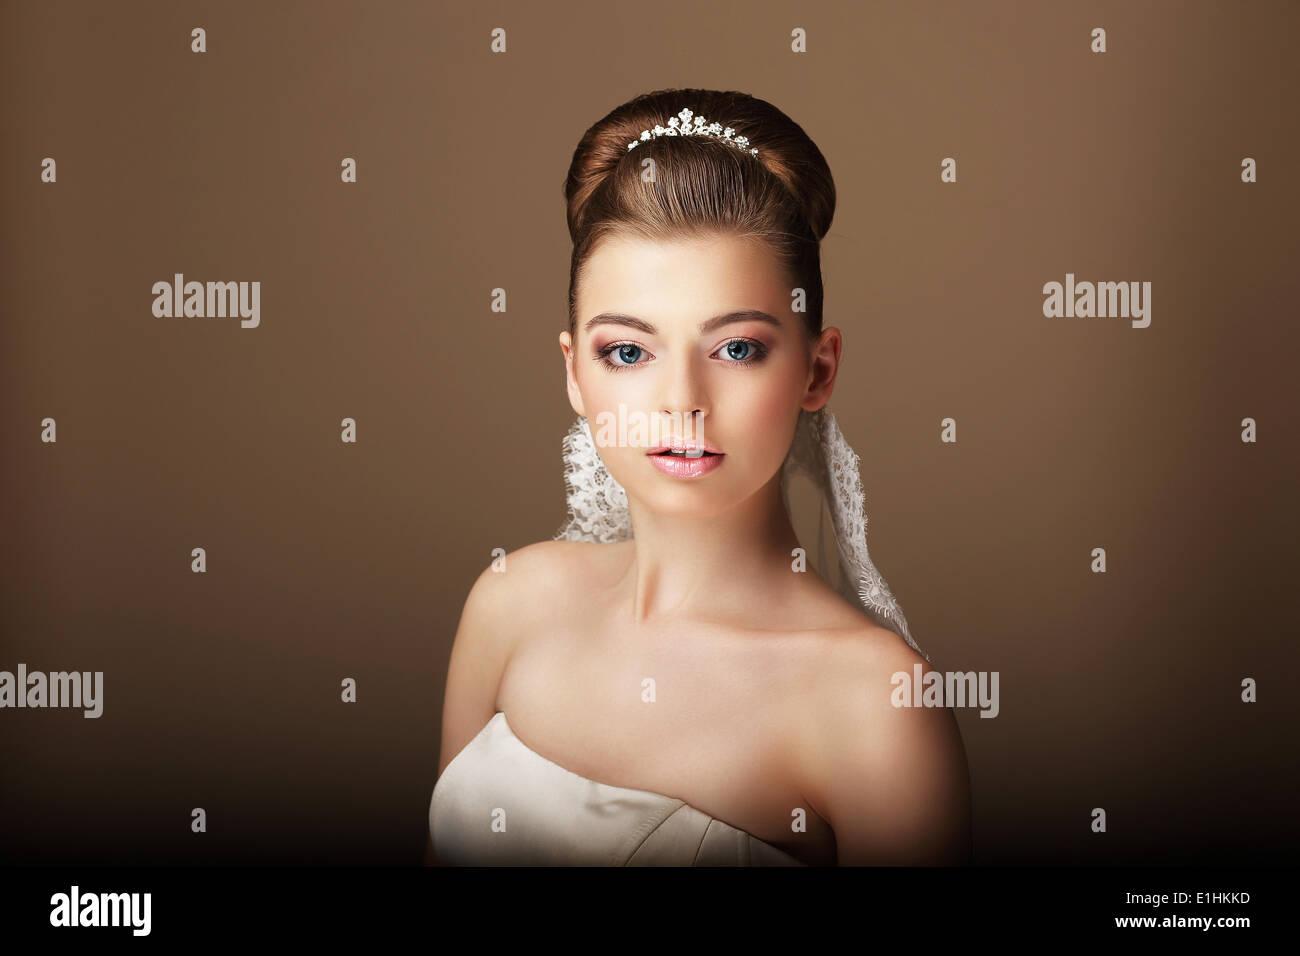 Retrato de joven morenita con maquillaje natural Foto de stock